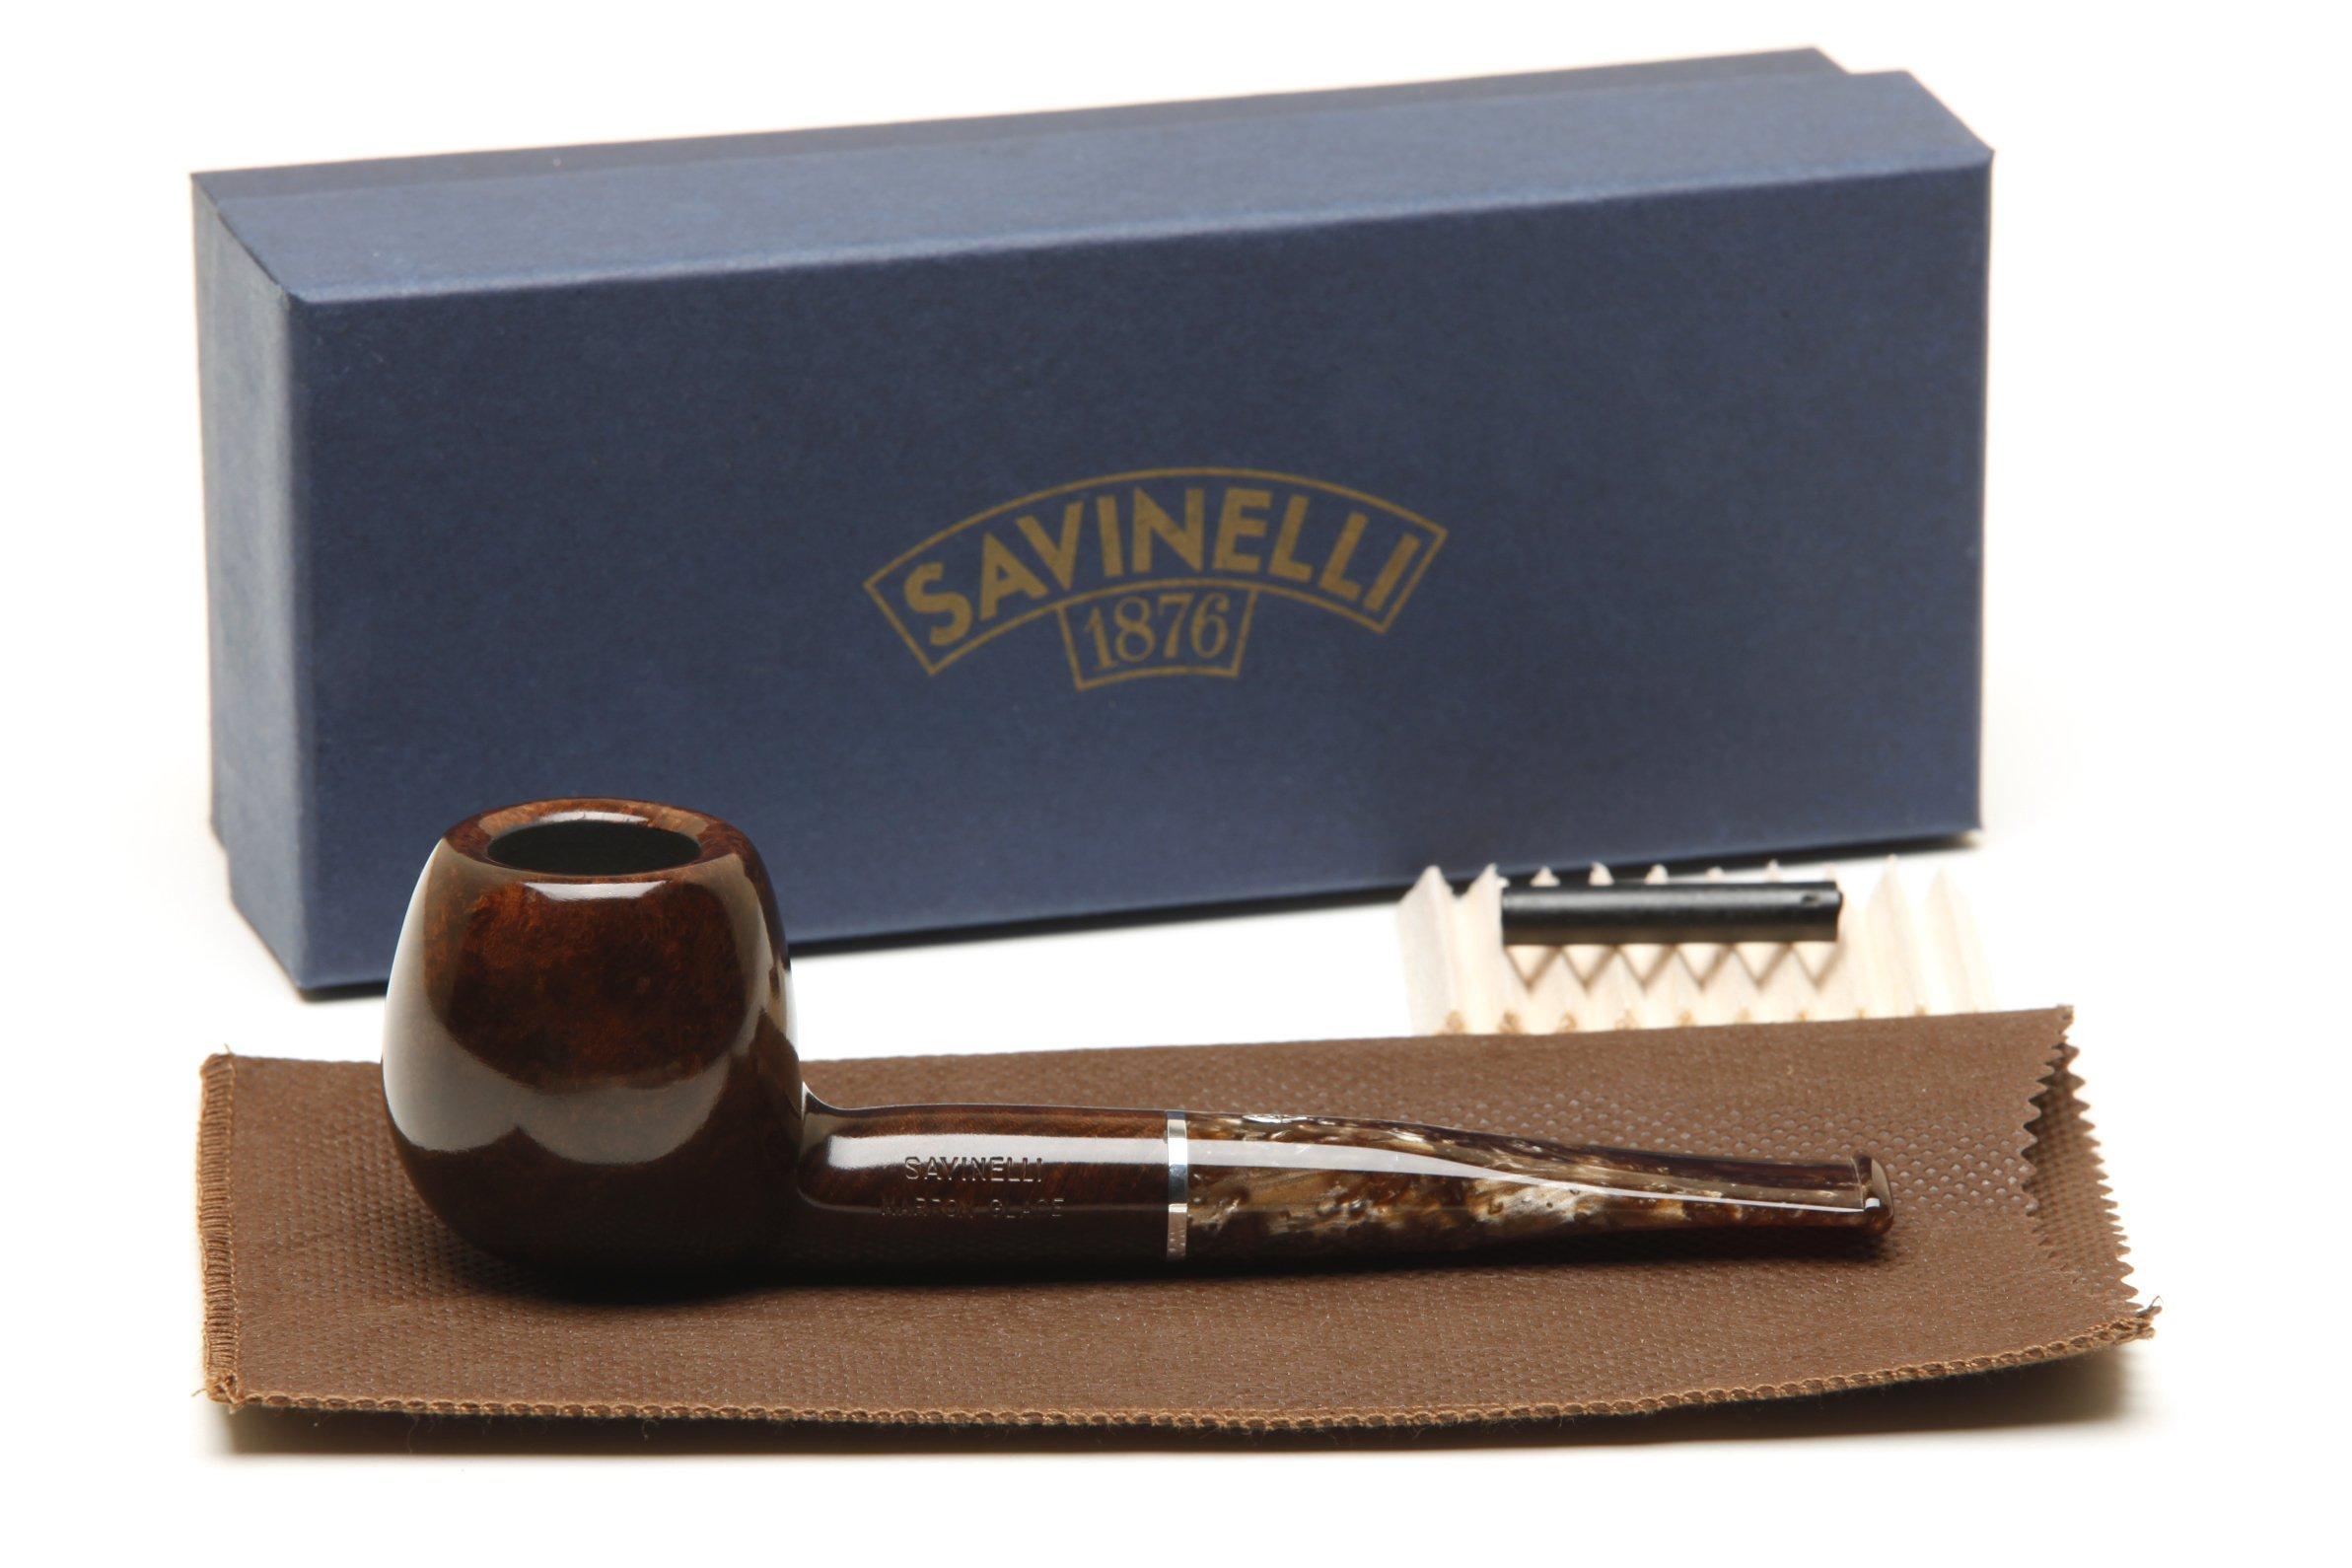 Savinelli Marron Glace 207 Smooth Brown Tobacco Pipe